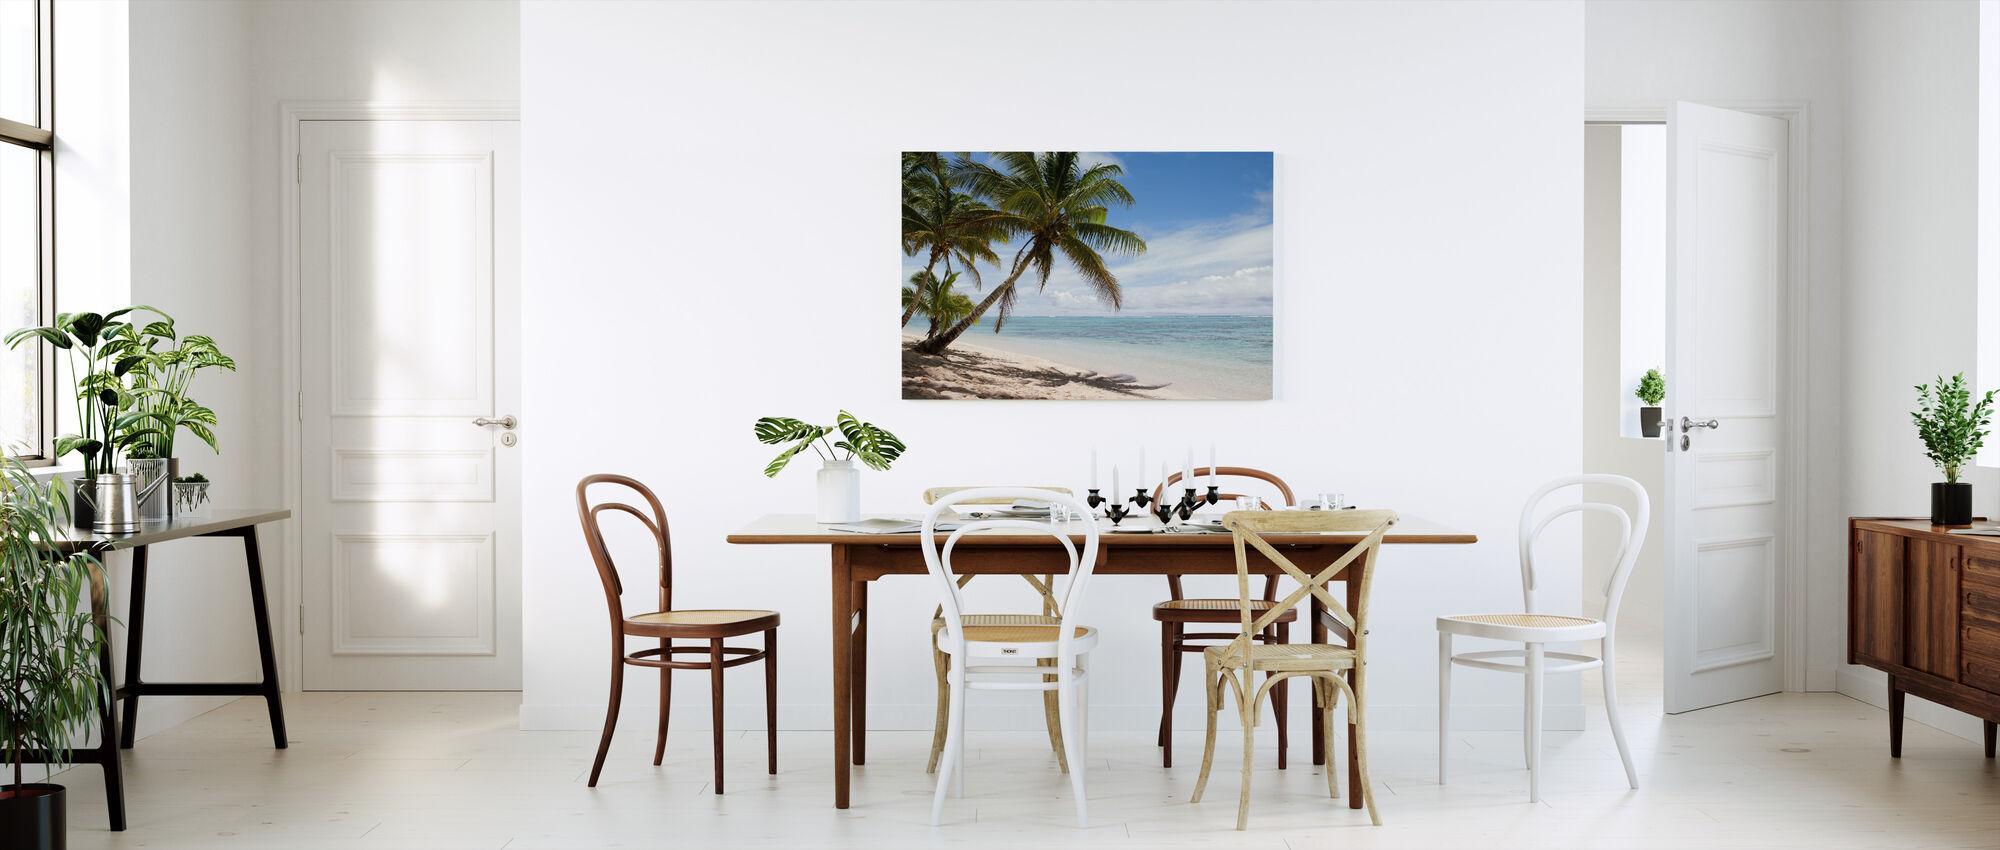 Tropical Beach Scene - Canvas print - Kitchen